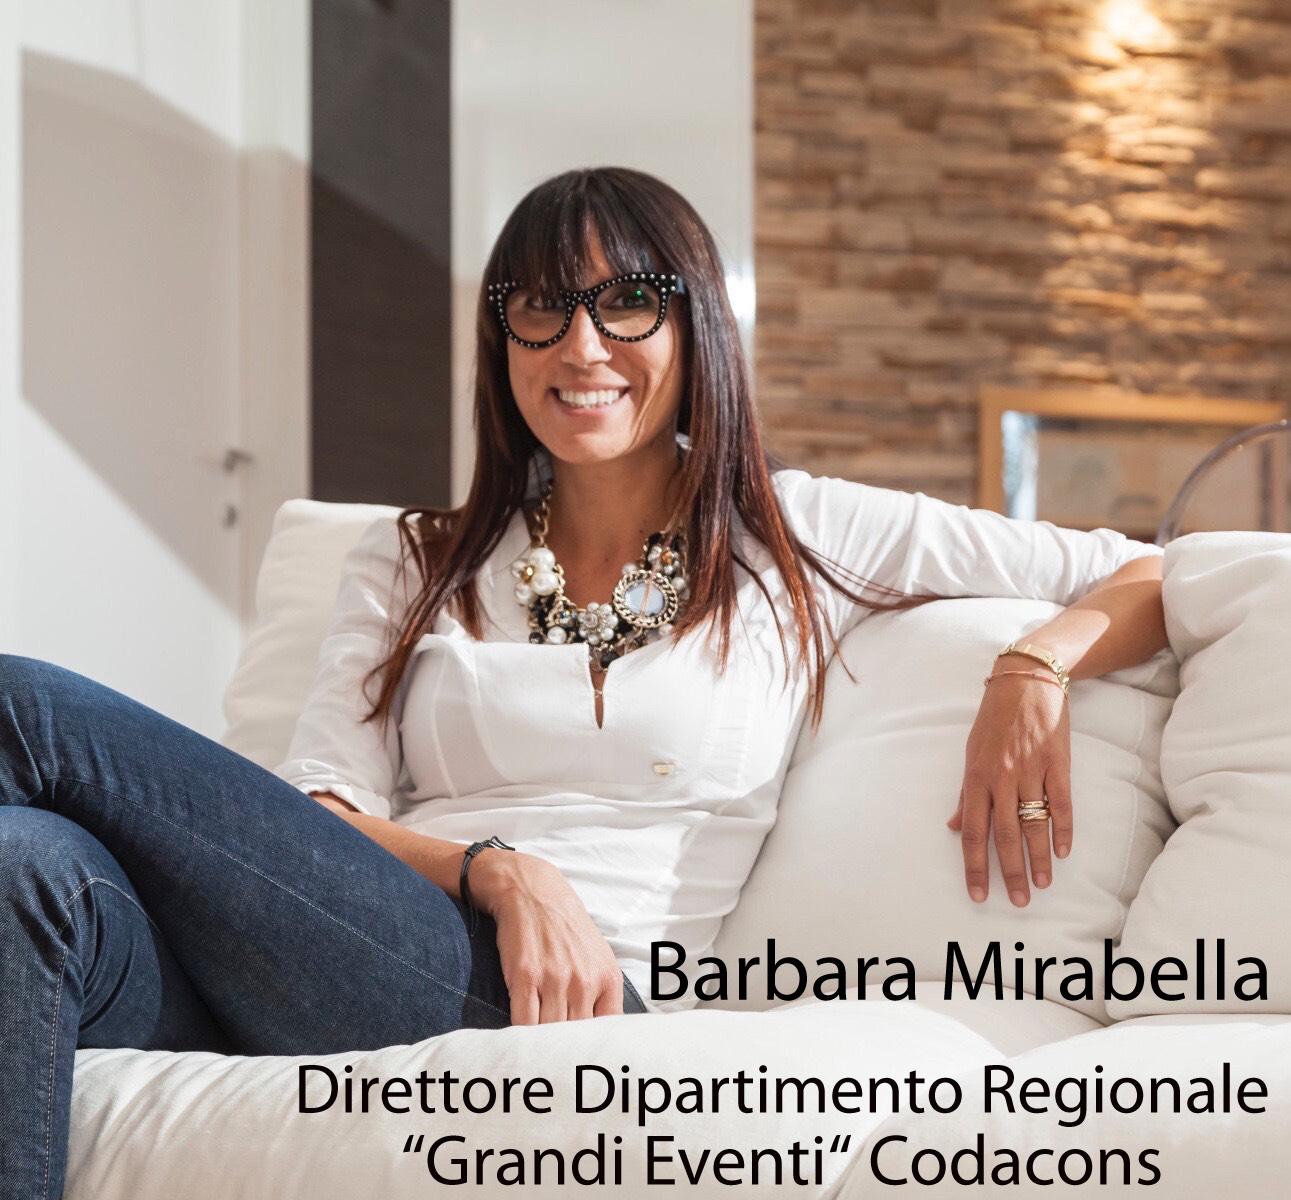 Assessore Barbara Mirabella